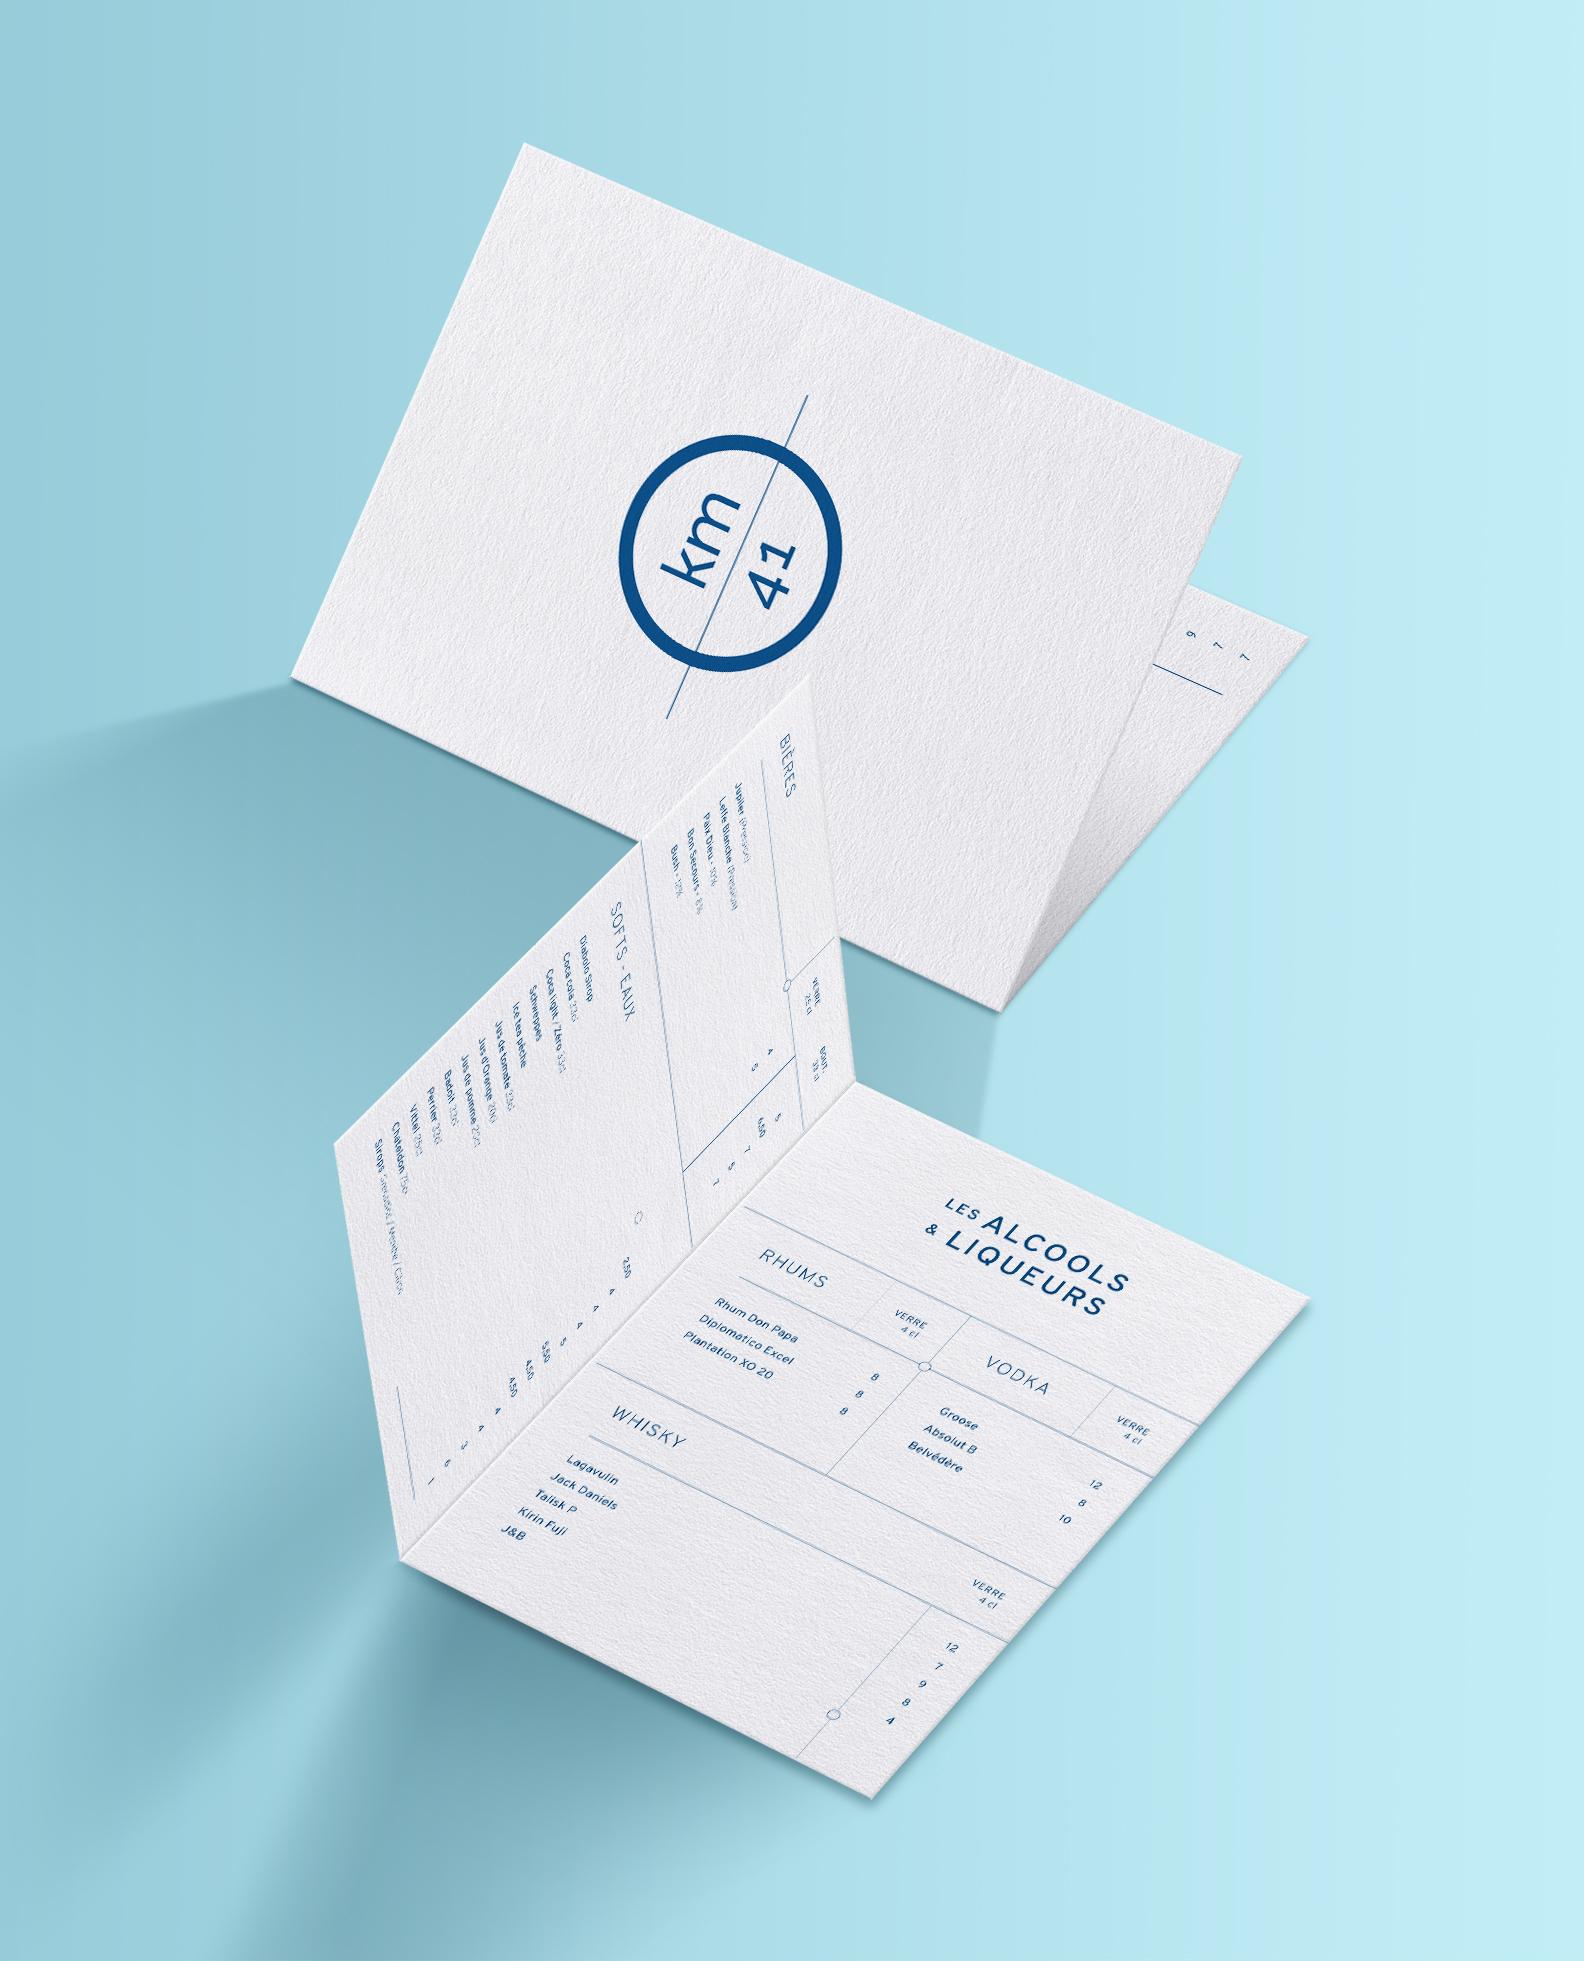 Free A4 Folded Brochure PSD Mockup.jpg